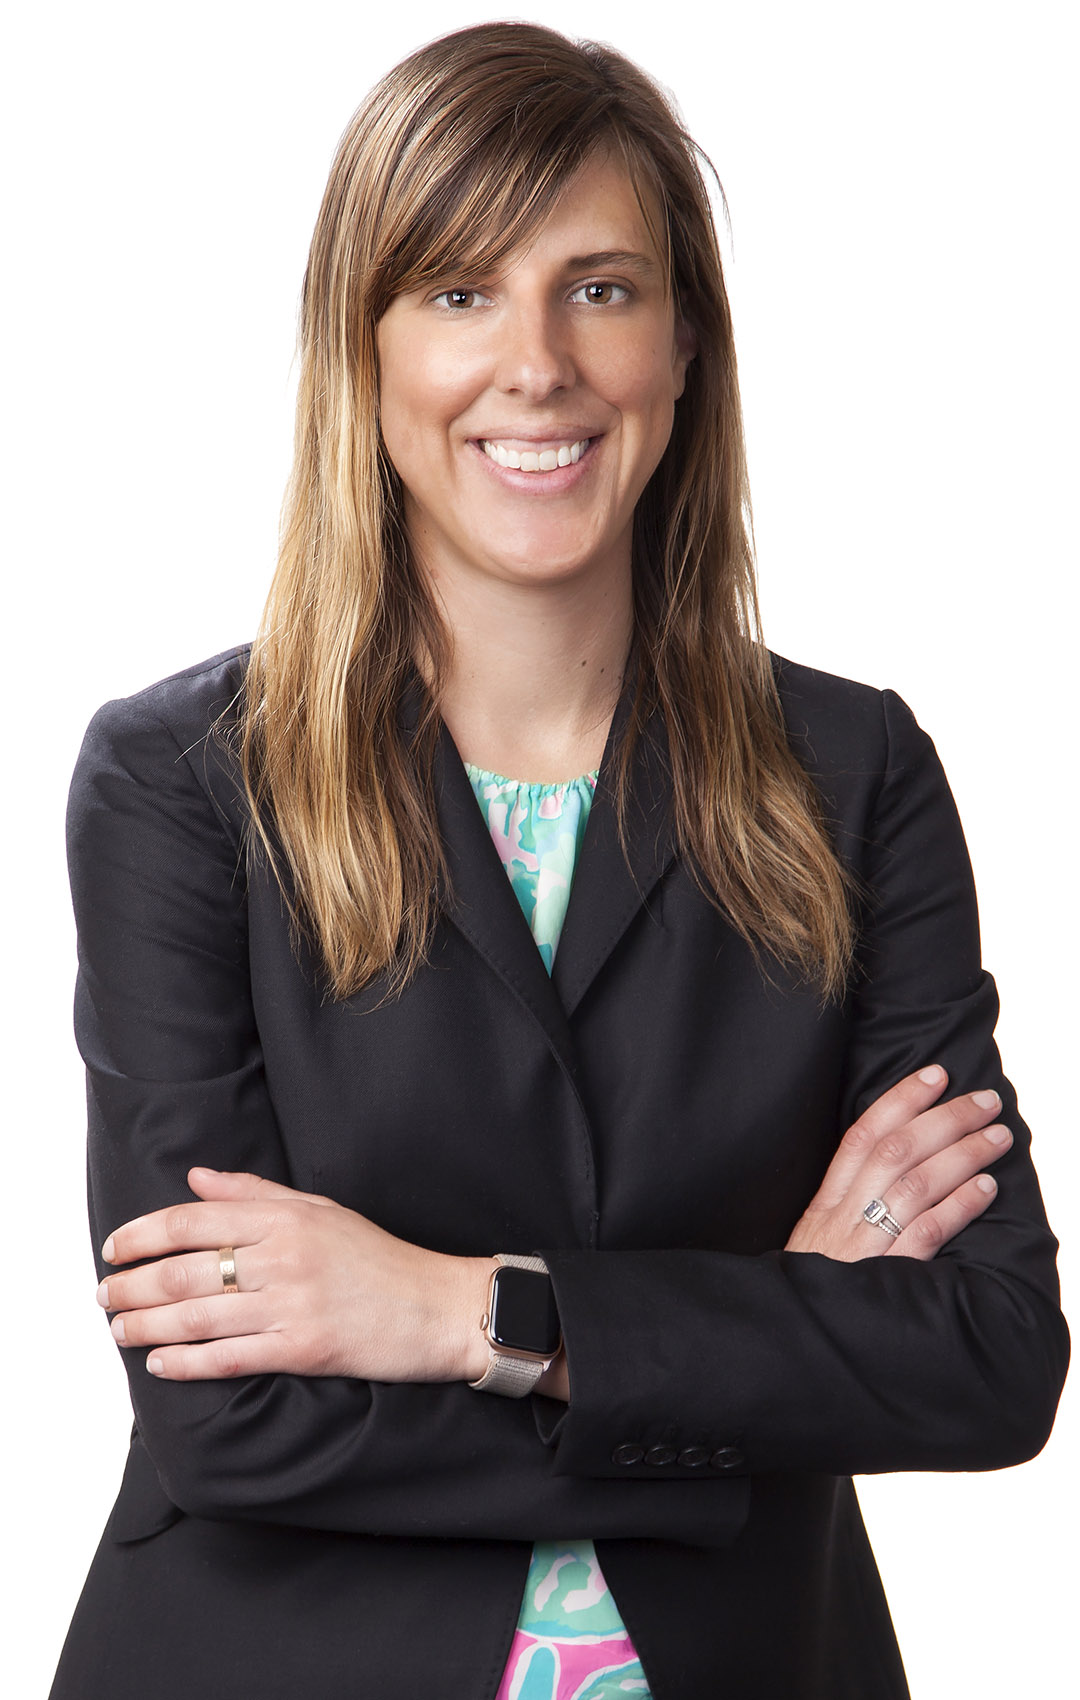 Jessica C. Jeffrey